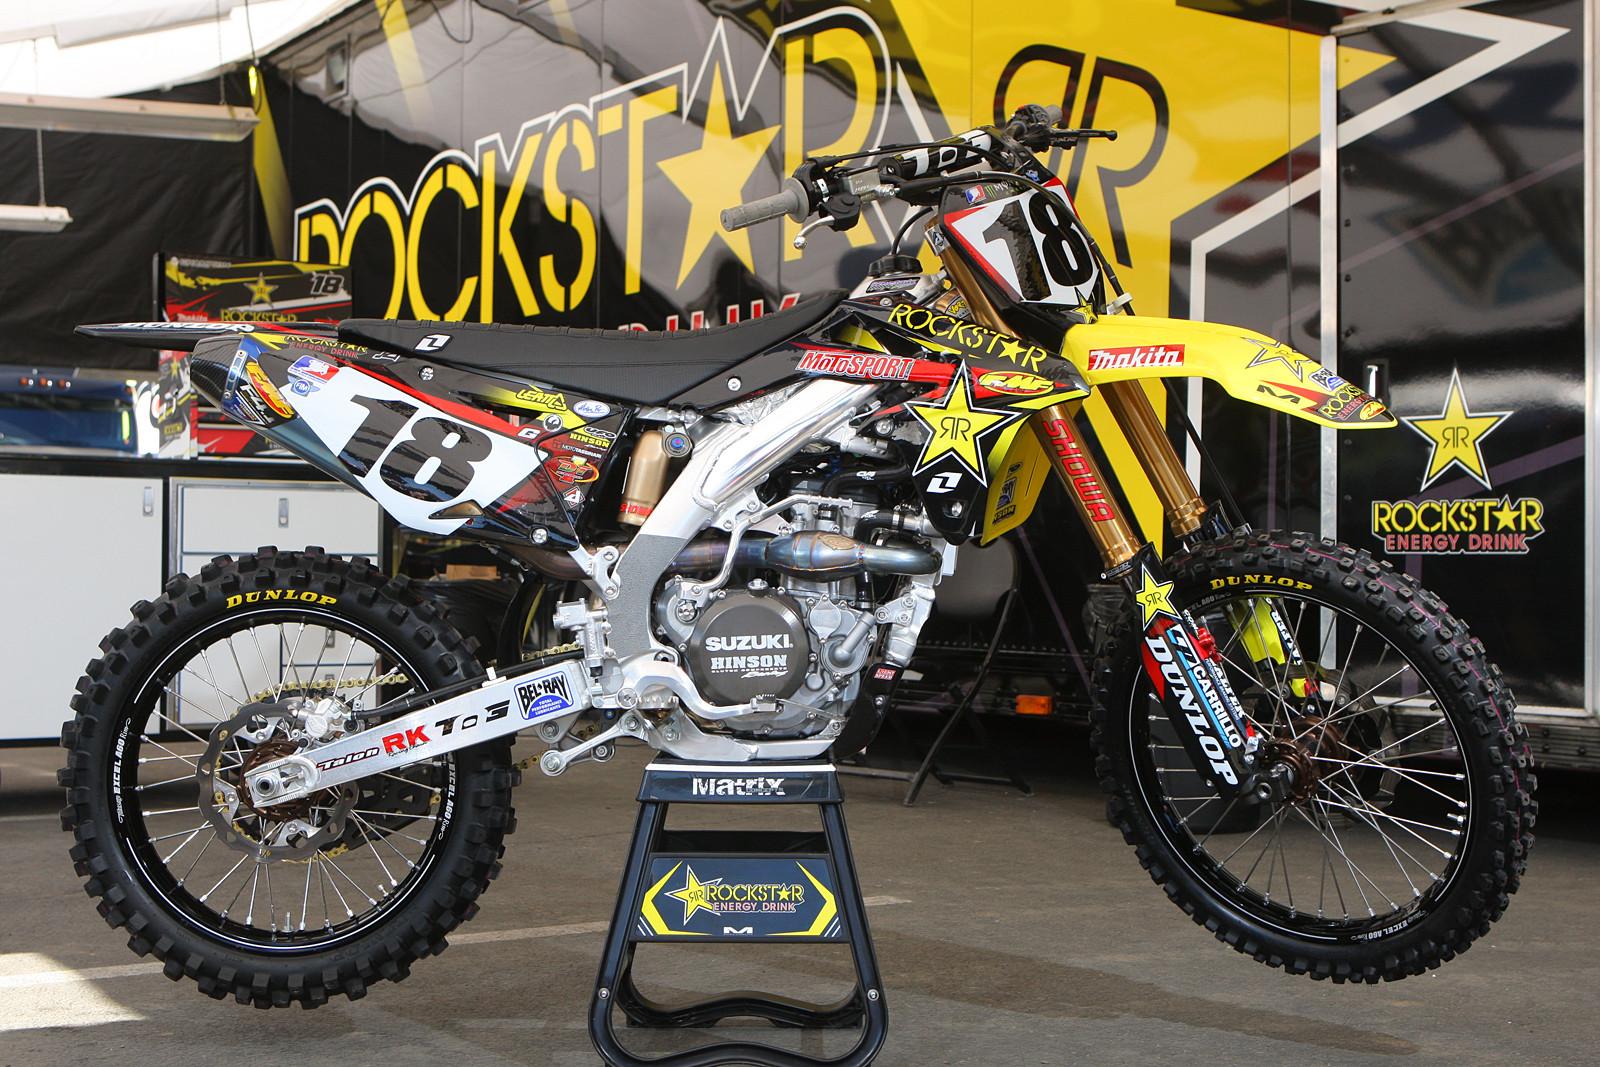 Millsaps Bike Moto Related Motocross Forums Message Boards Kx 125 Wiring Diagram Forum